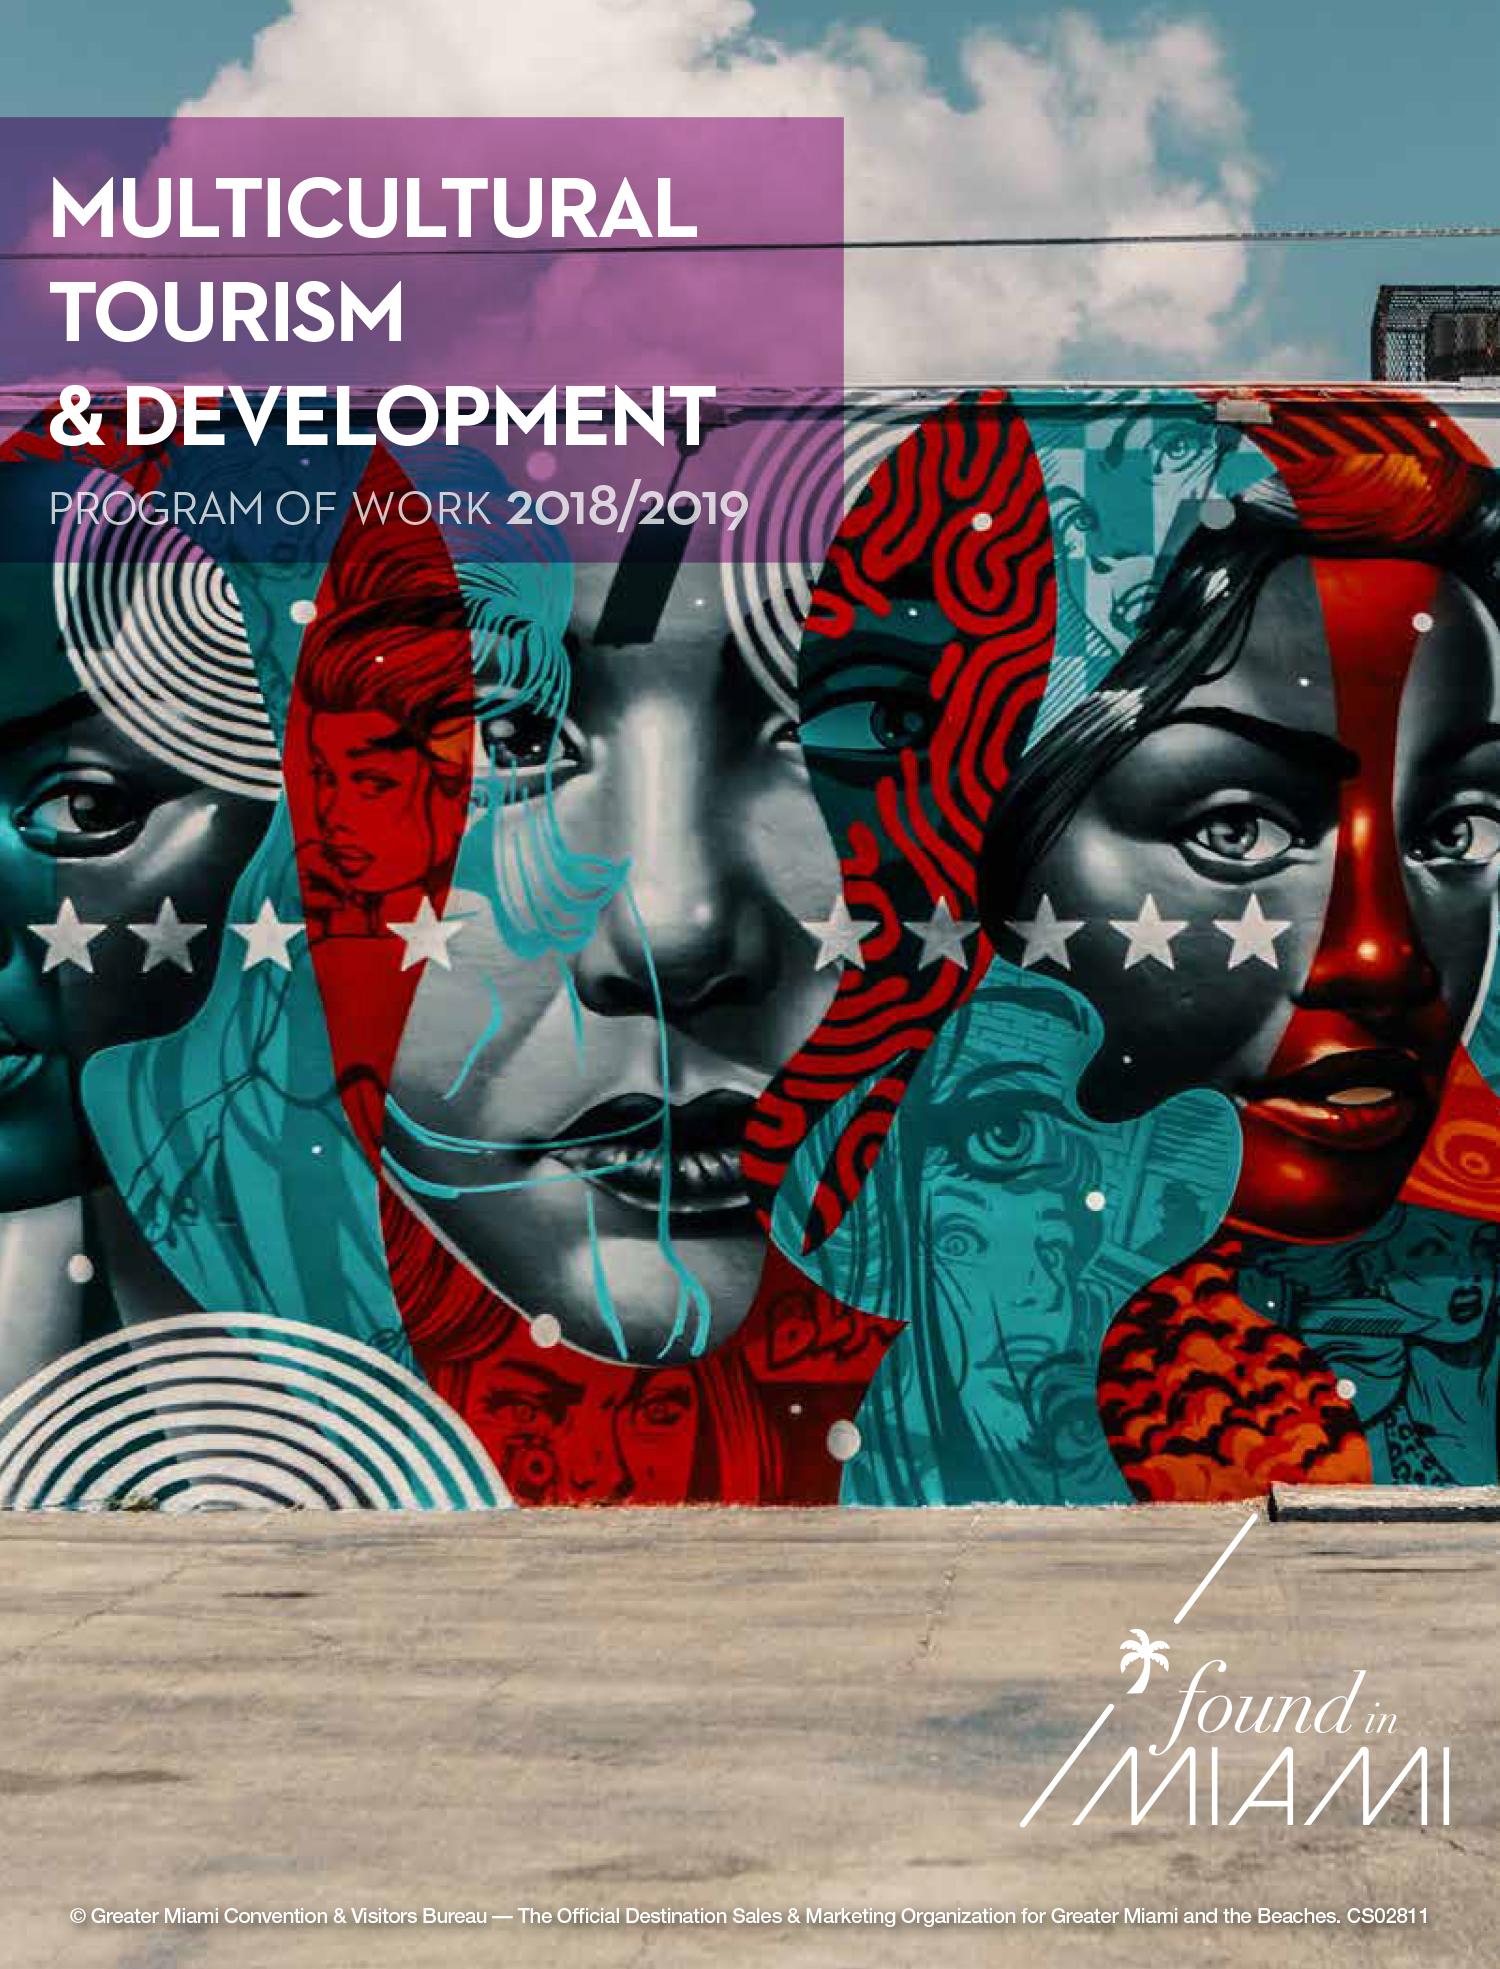 02811-MKT-POW 2018-2019 _Multicultural Tourism 1.1 copy.jpg